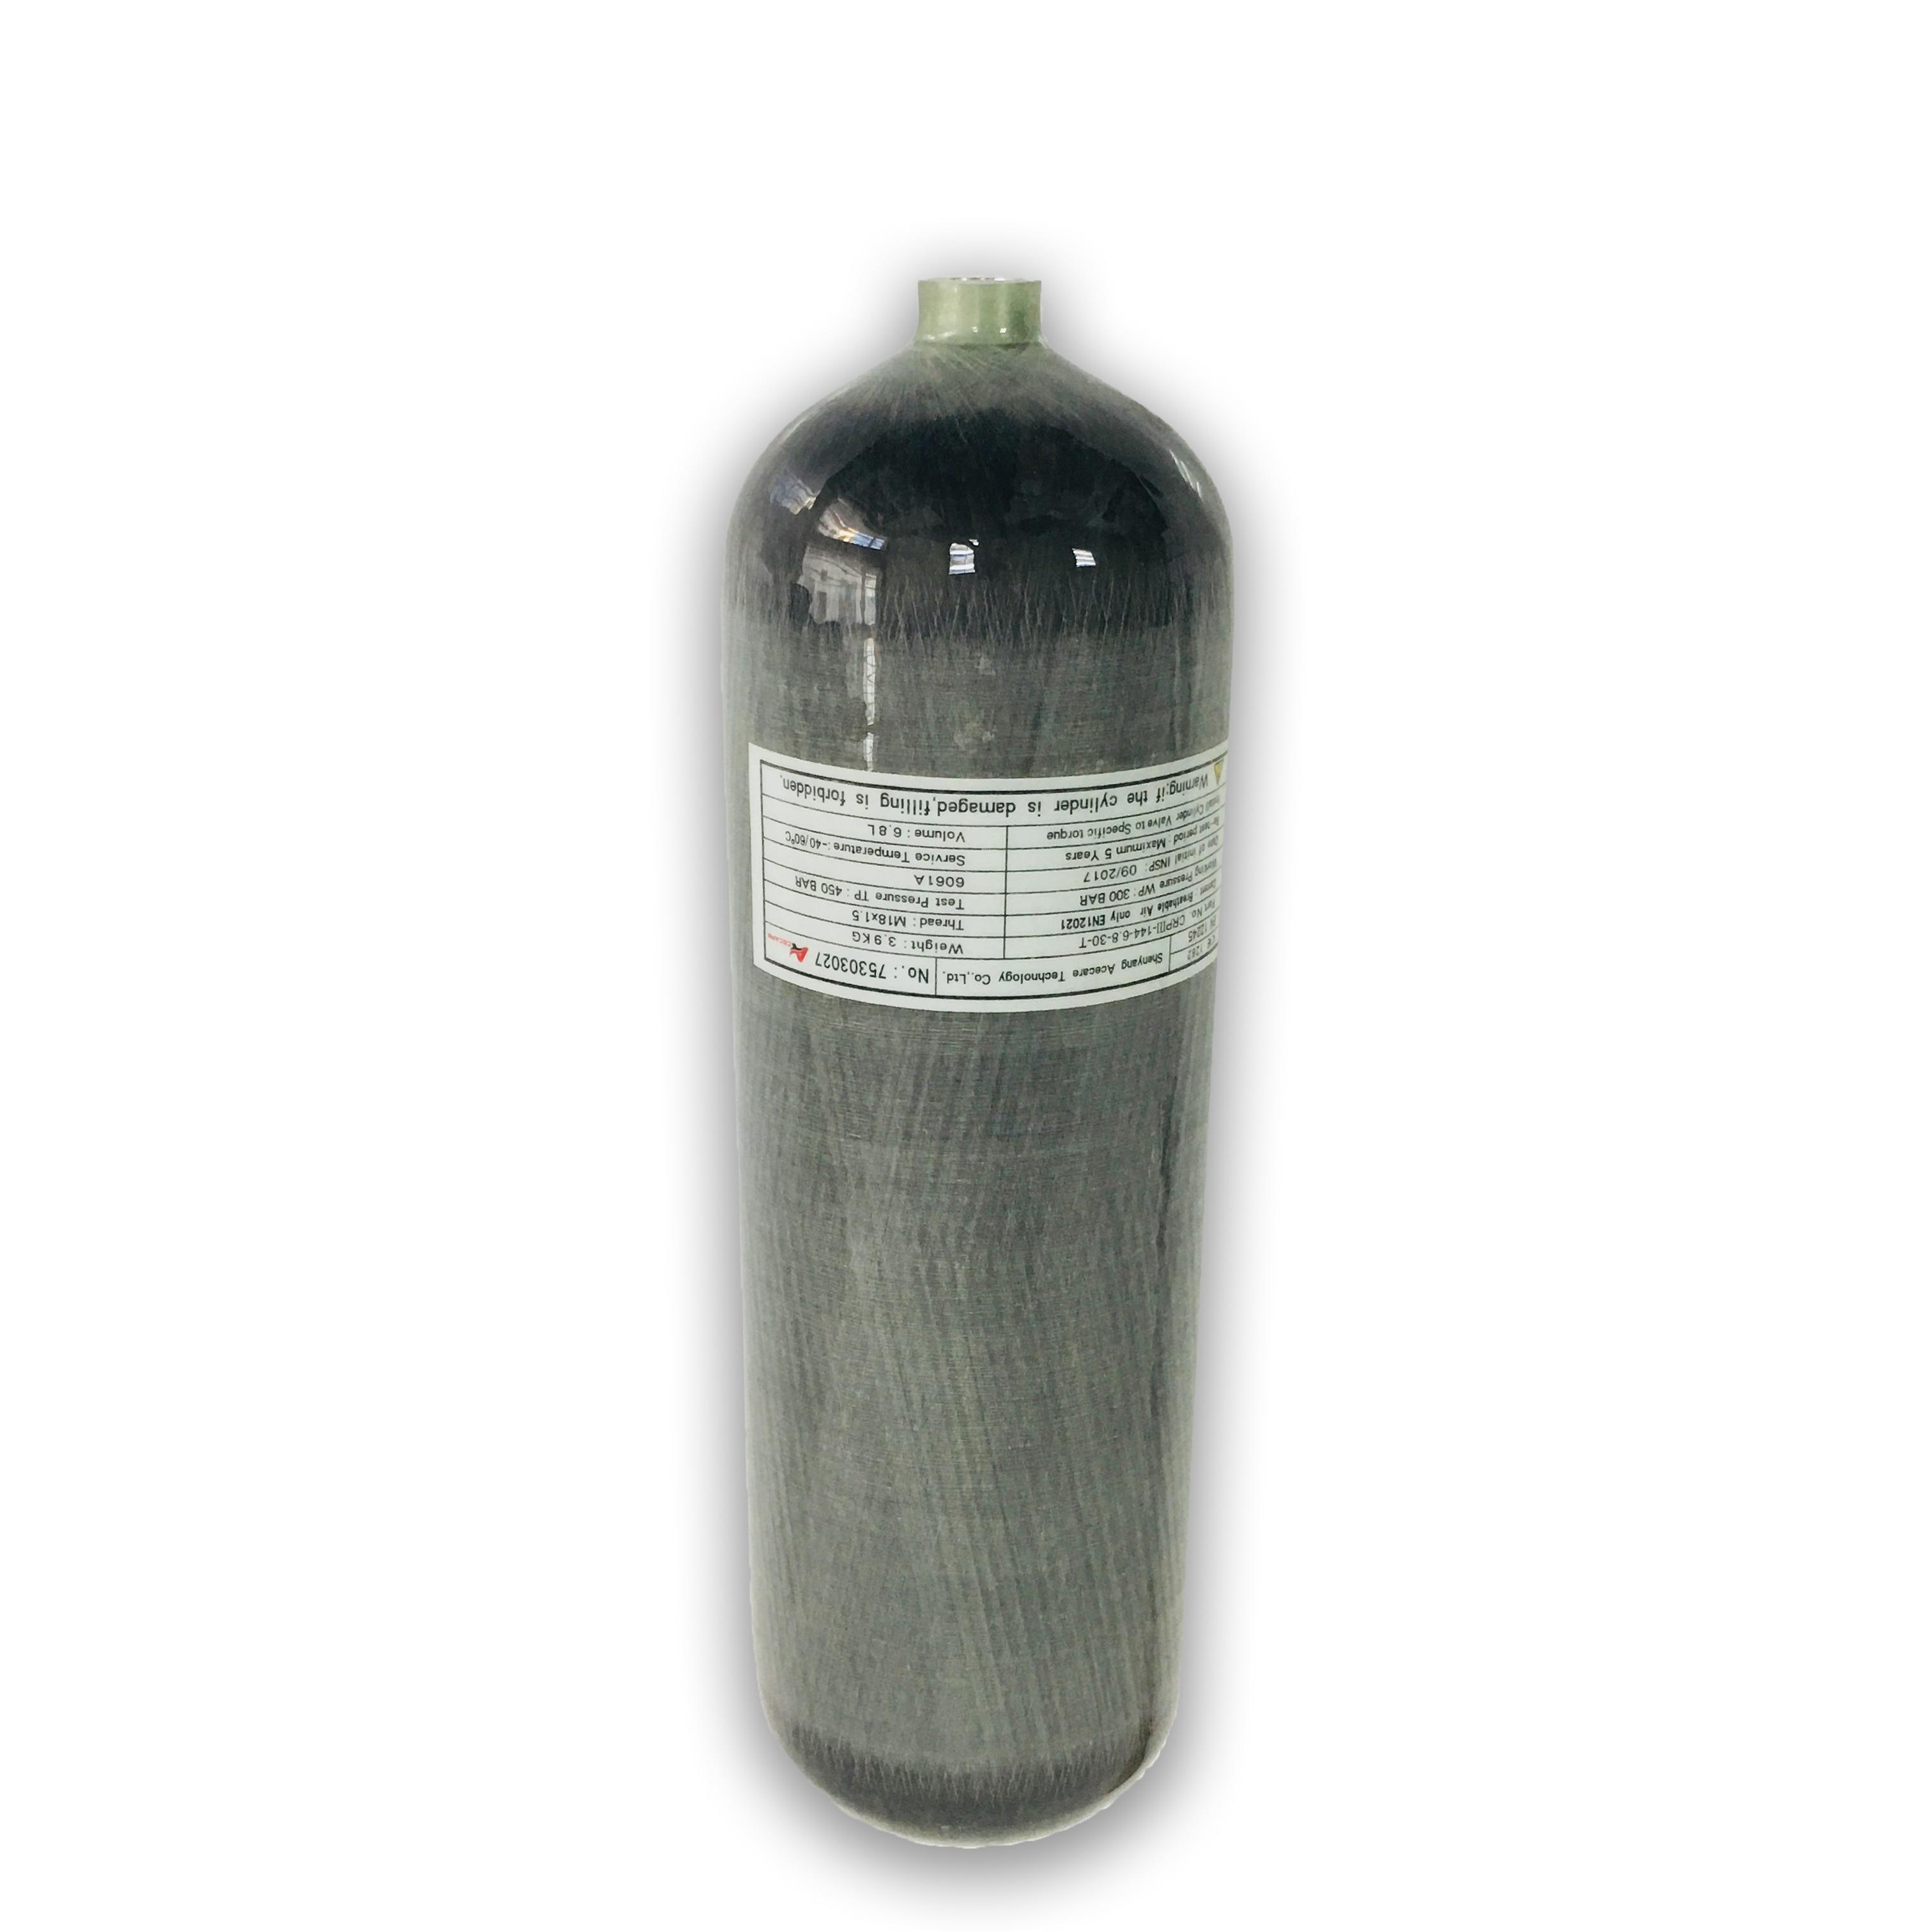 AC168 6.8L CE 30Mpa 4500Psi Paintball Condor Pcp Carbon Fiber Tank Pcp Rifle Compressed Air Guns Airsoft Pellets Acecare 2019